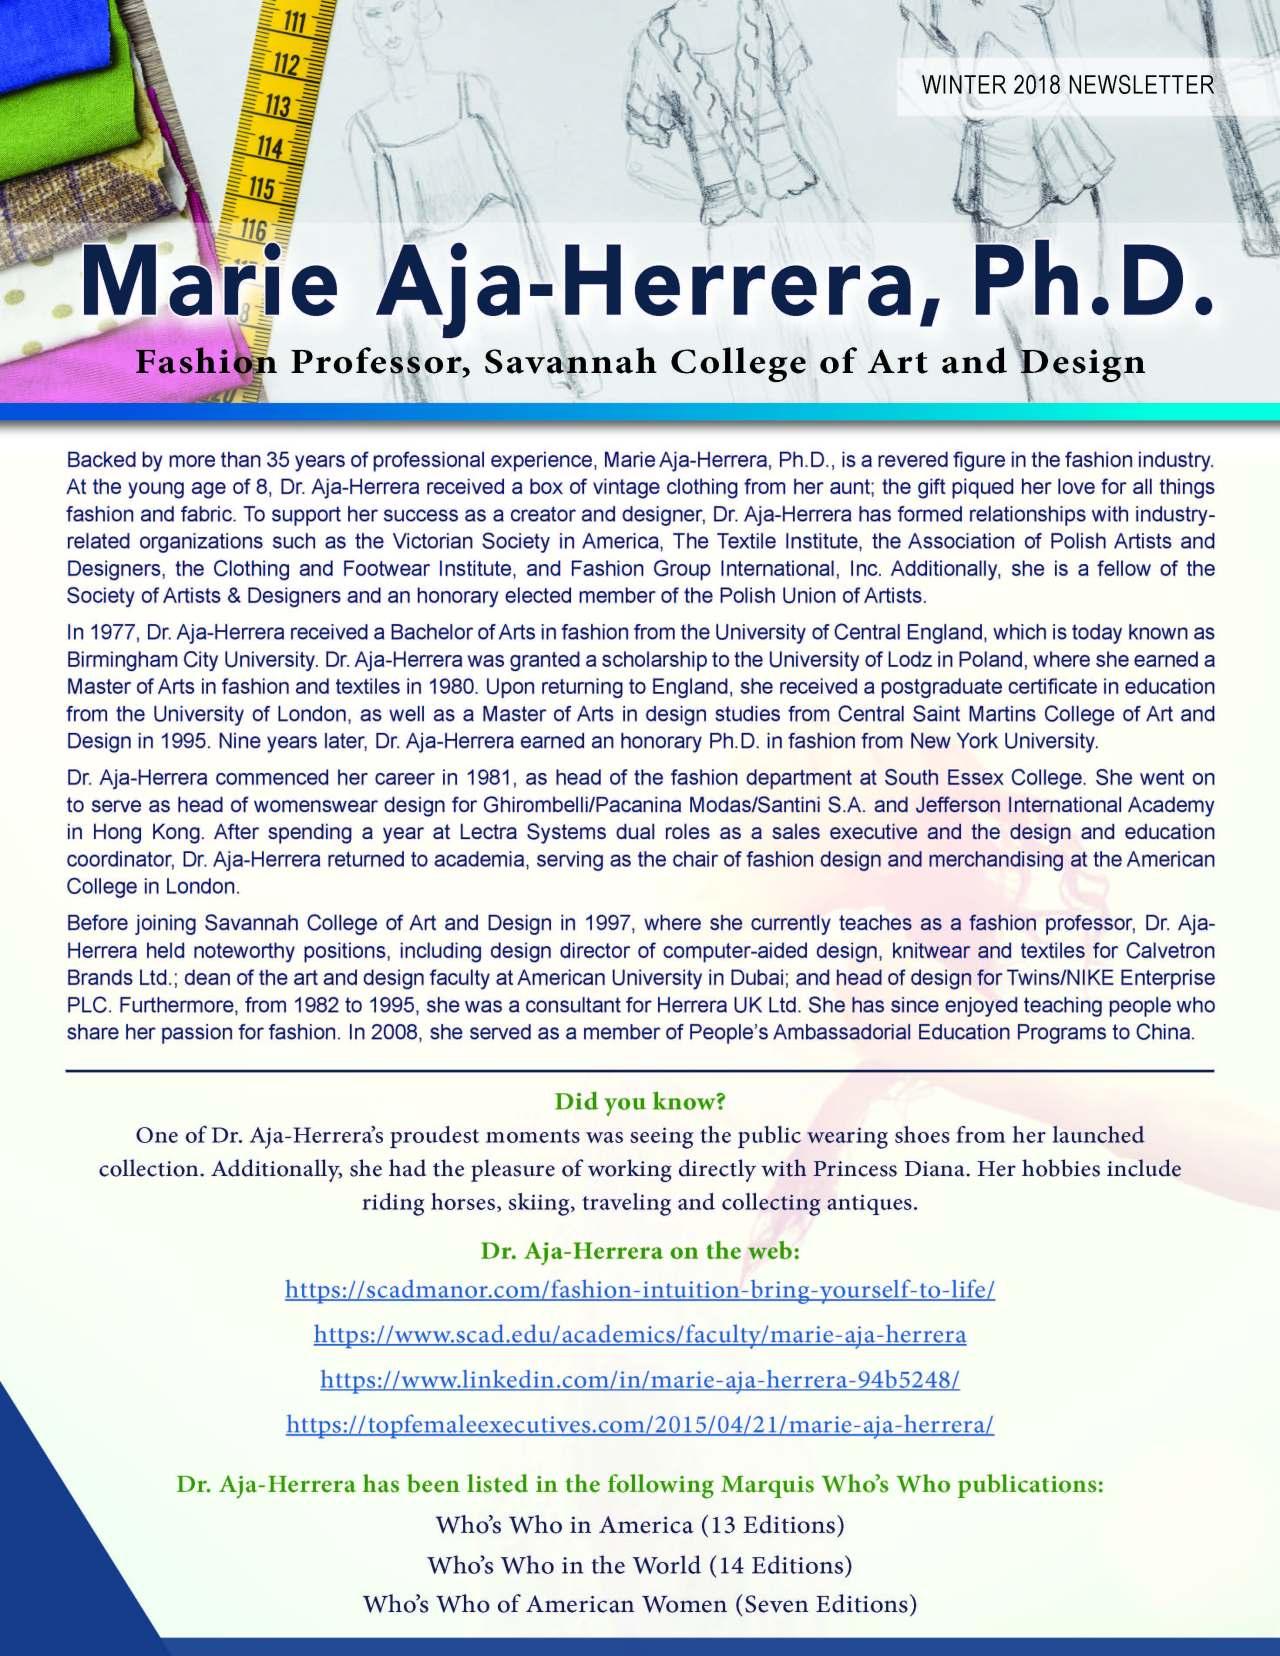 Aja-Herrera, Marie 3710544_28488443 Newsletter